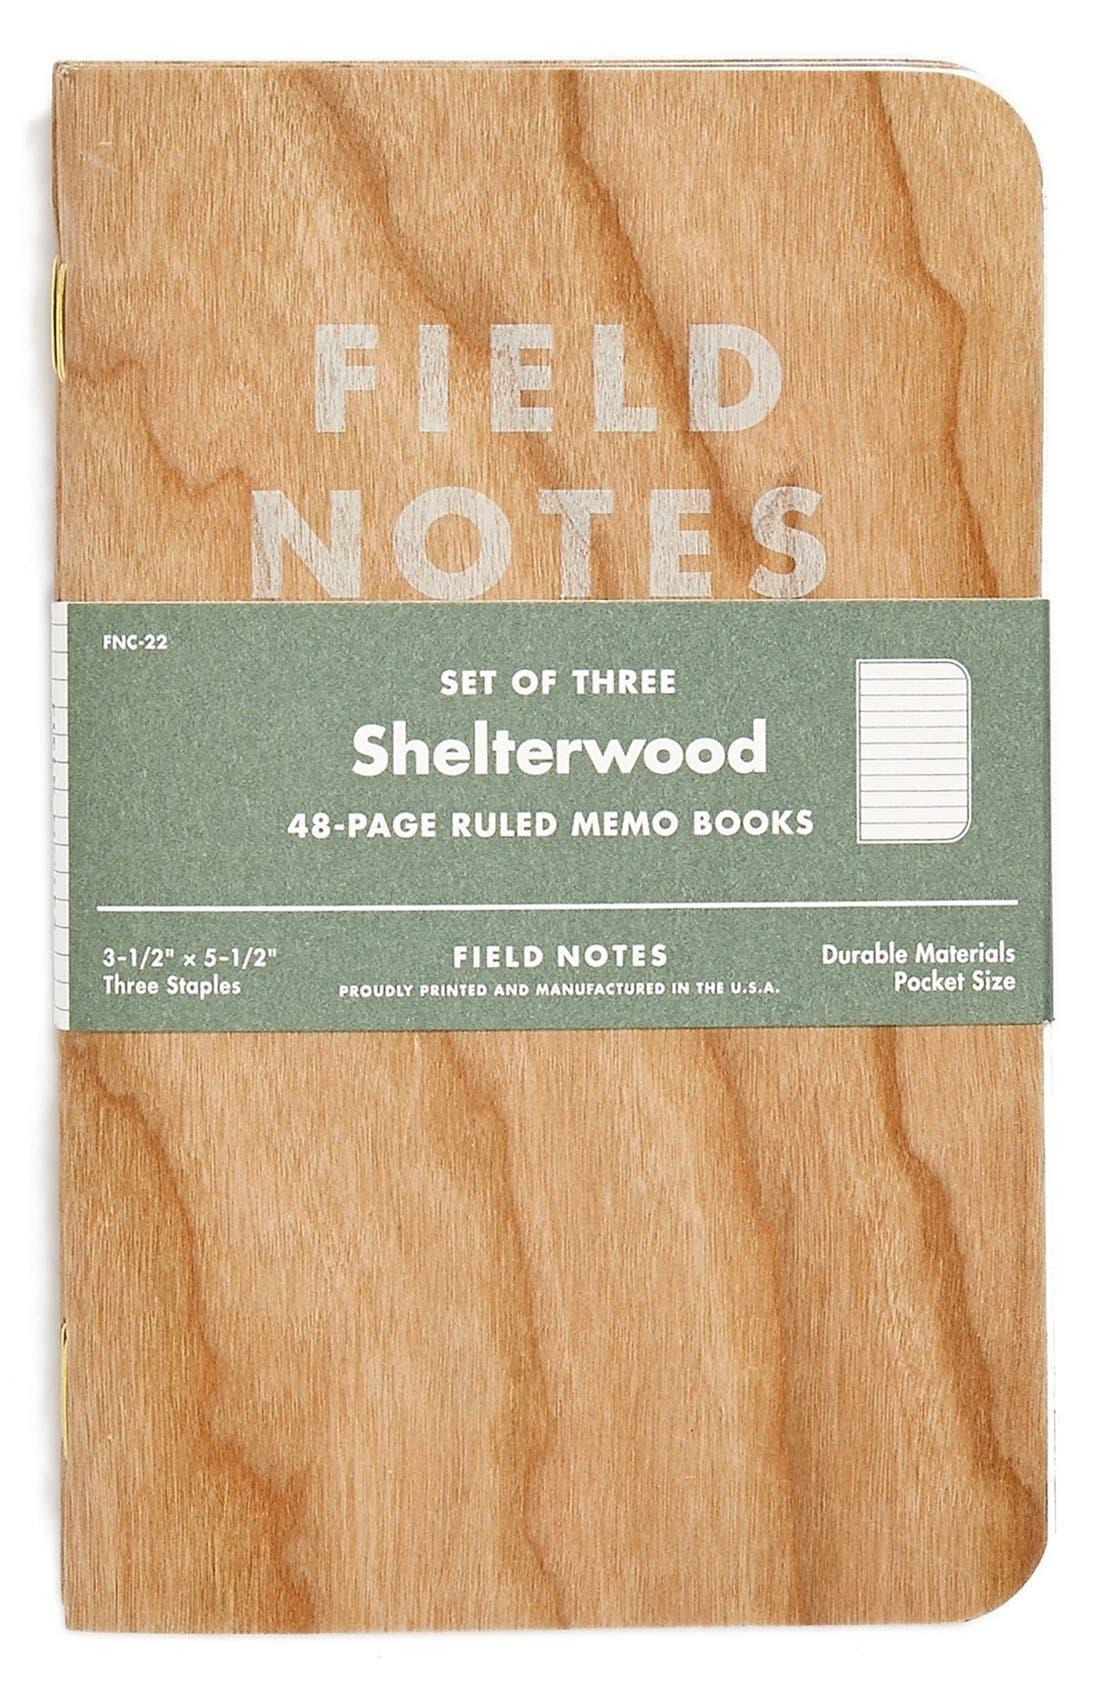 Alternate Image 2  - Field Notes 'Shelterwood' Memo Books (3-Pack)